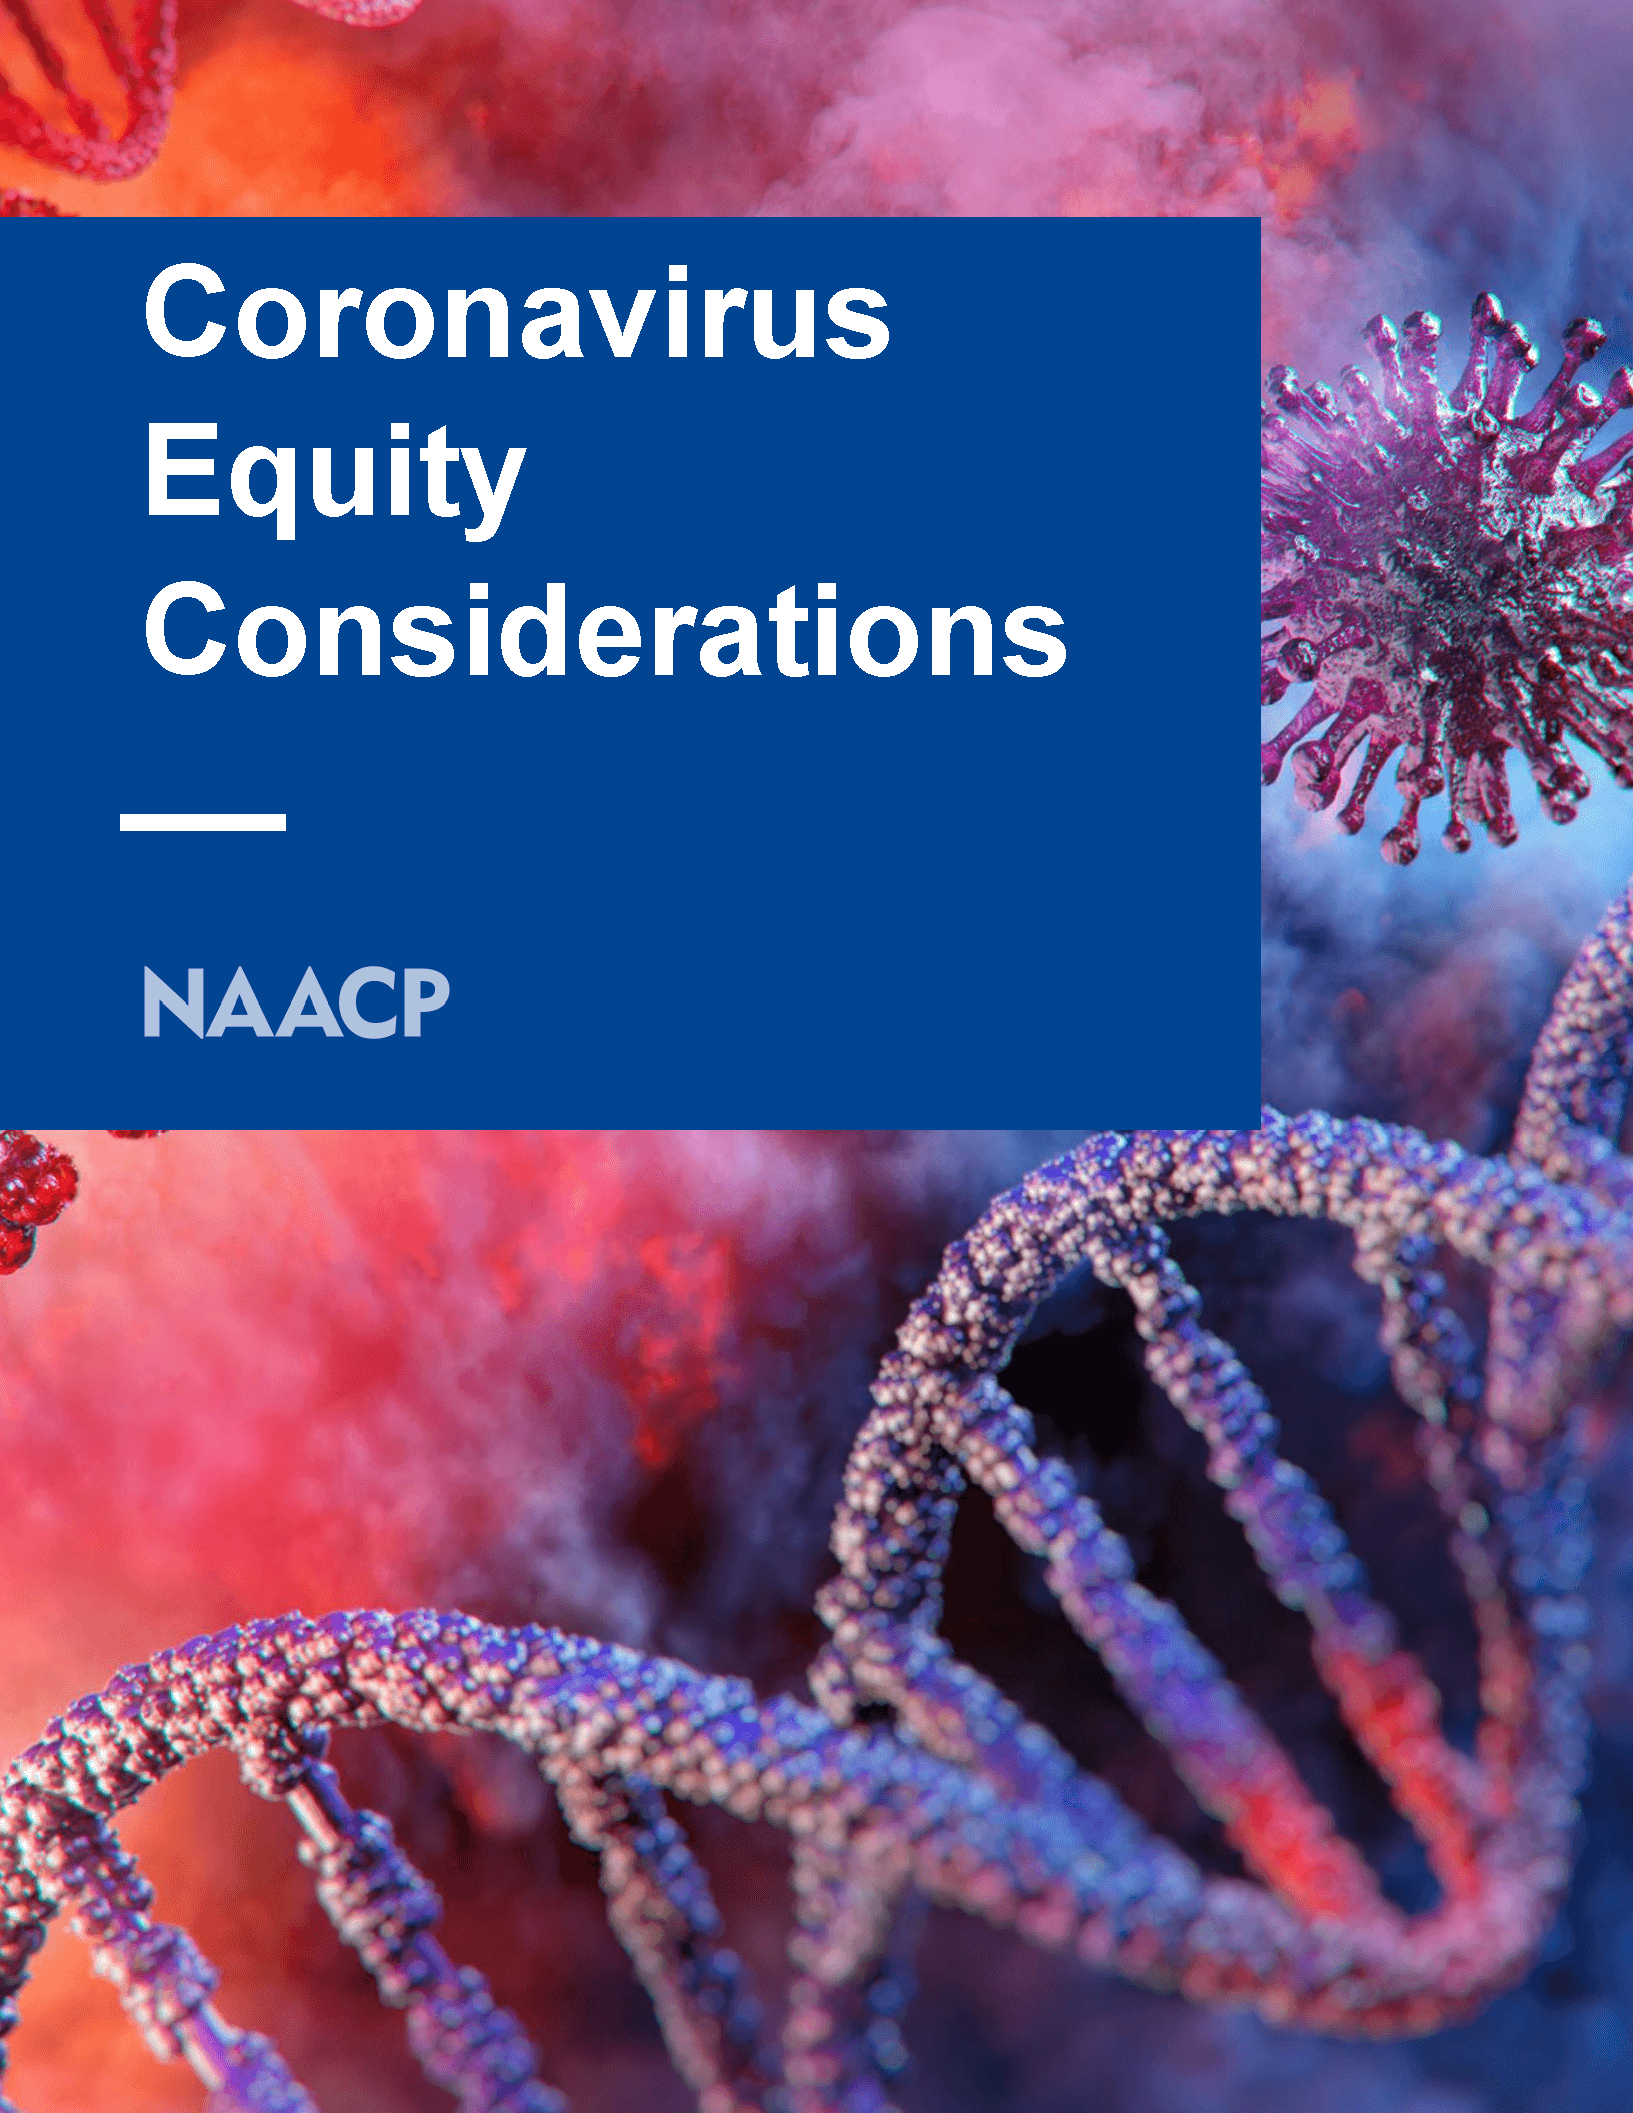 NAACP: Coronavirus Equity Considerations